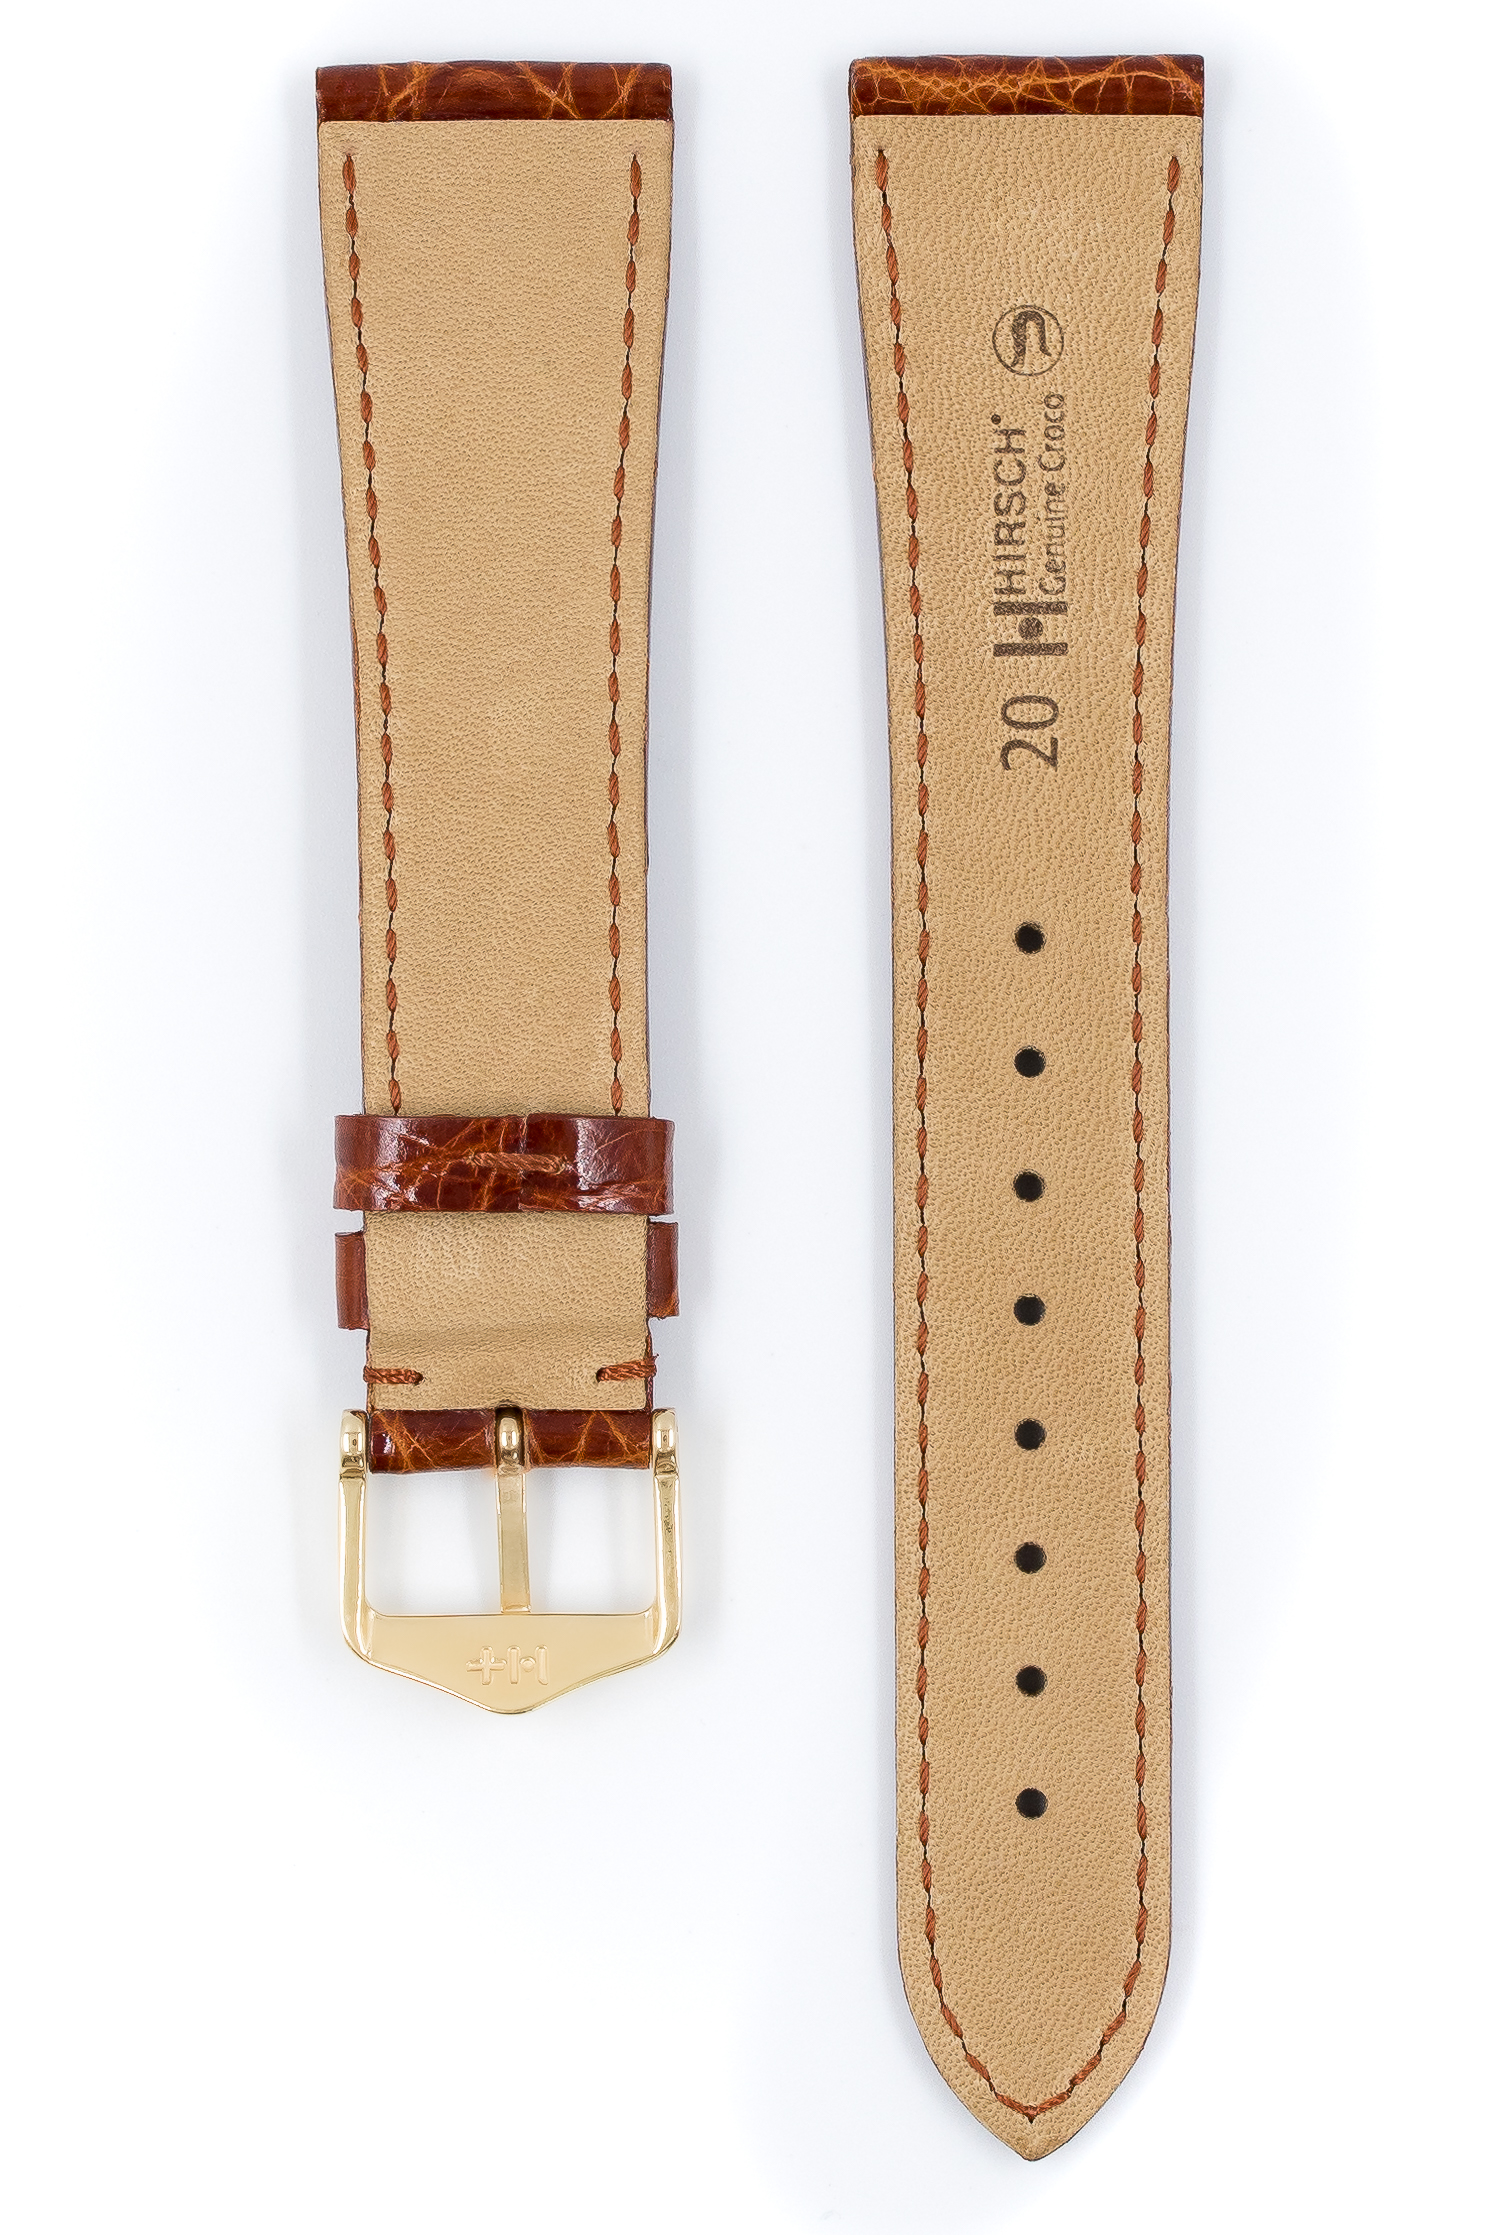 Uhrenarmband Echt Leder Edelstahl Dornschließe 20mm Neu Nr.071